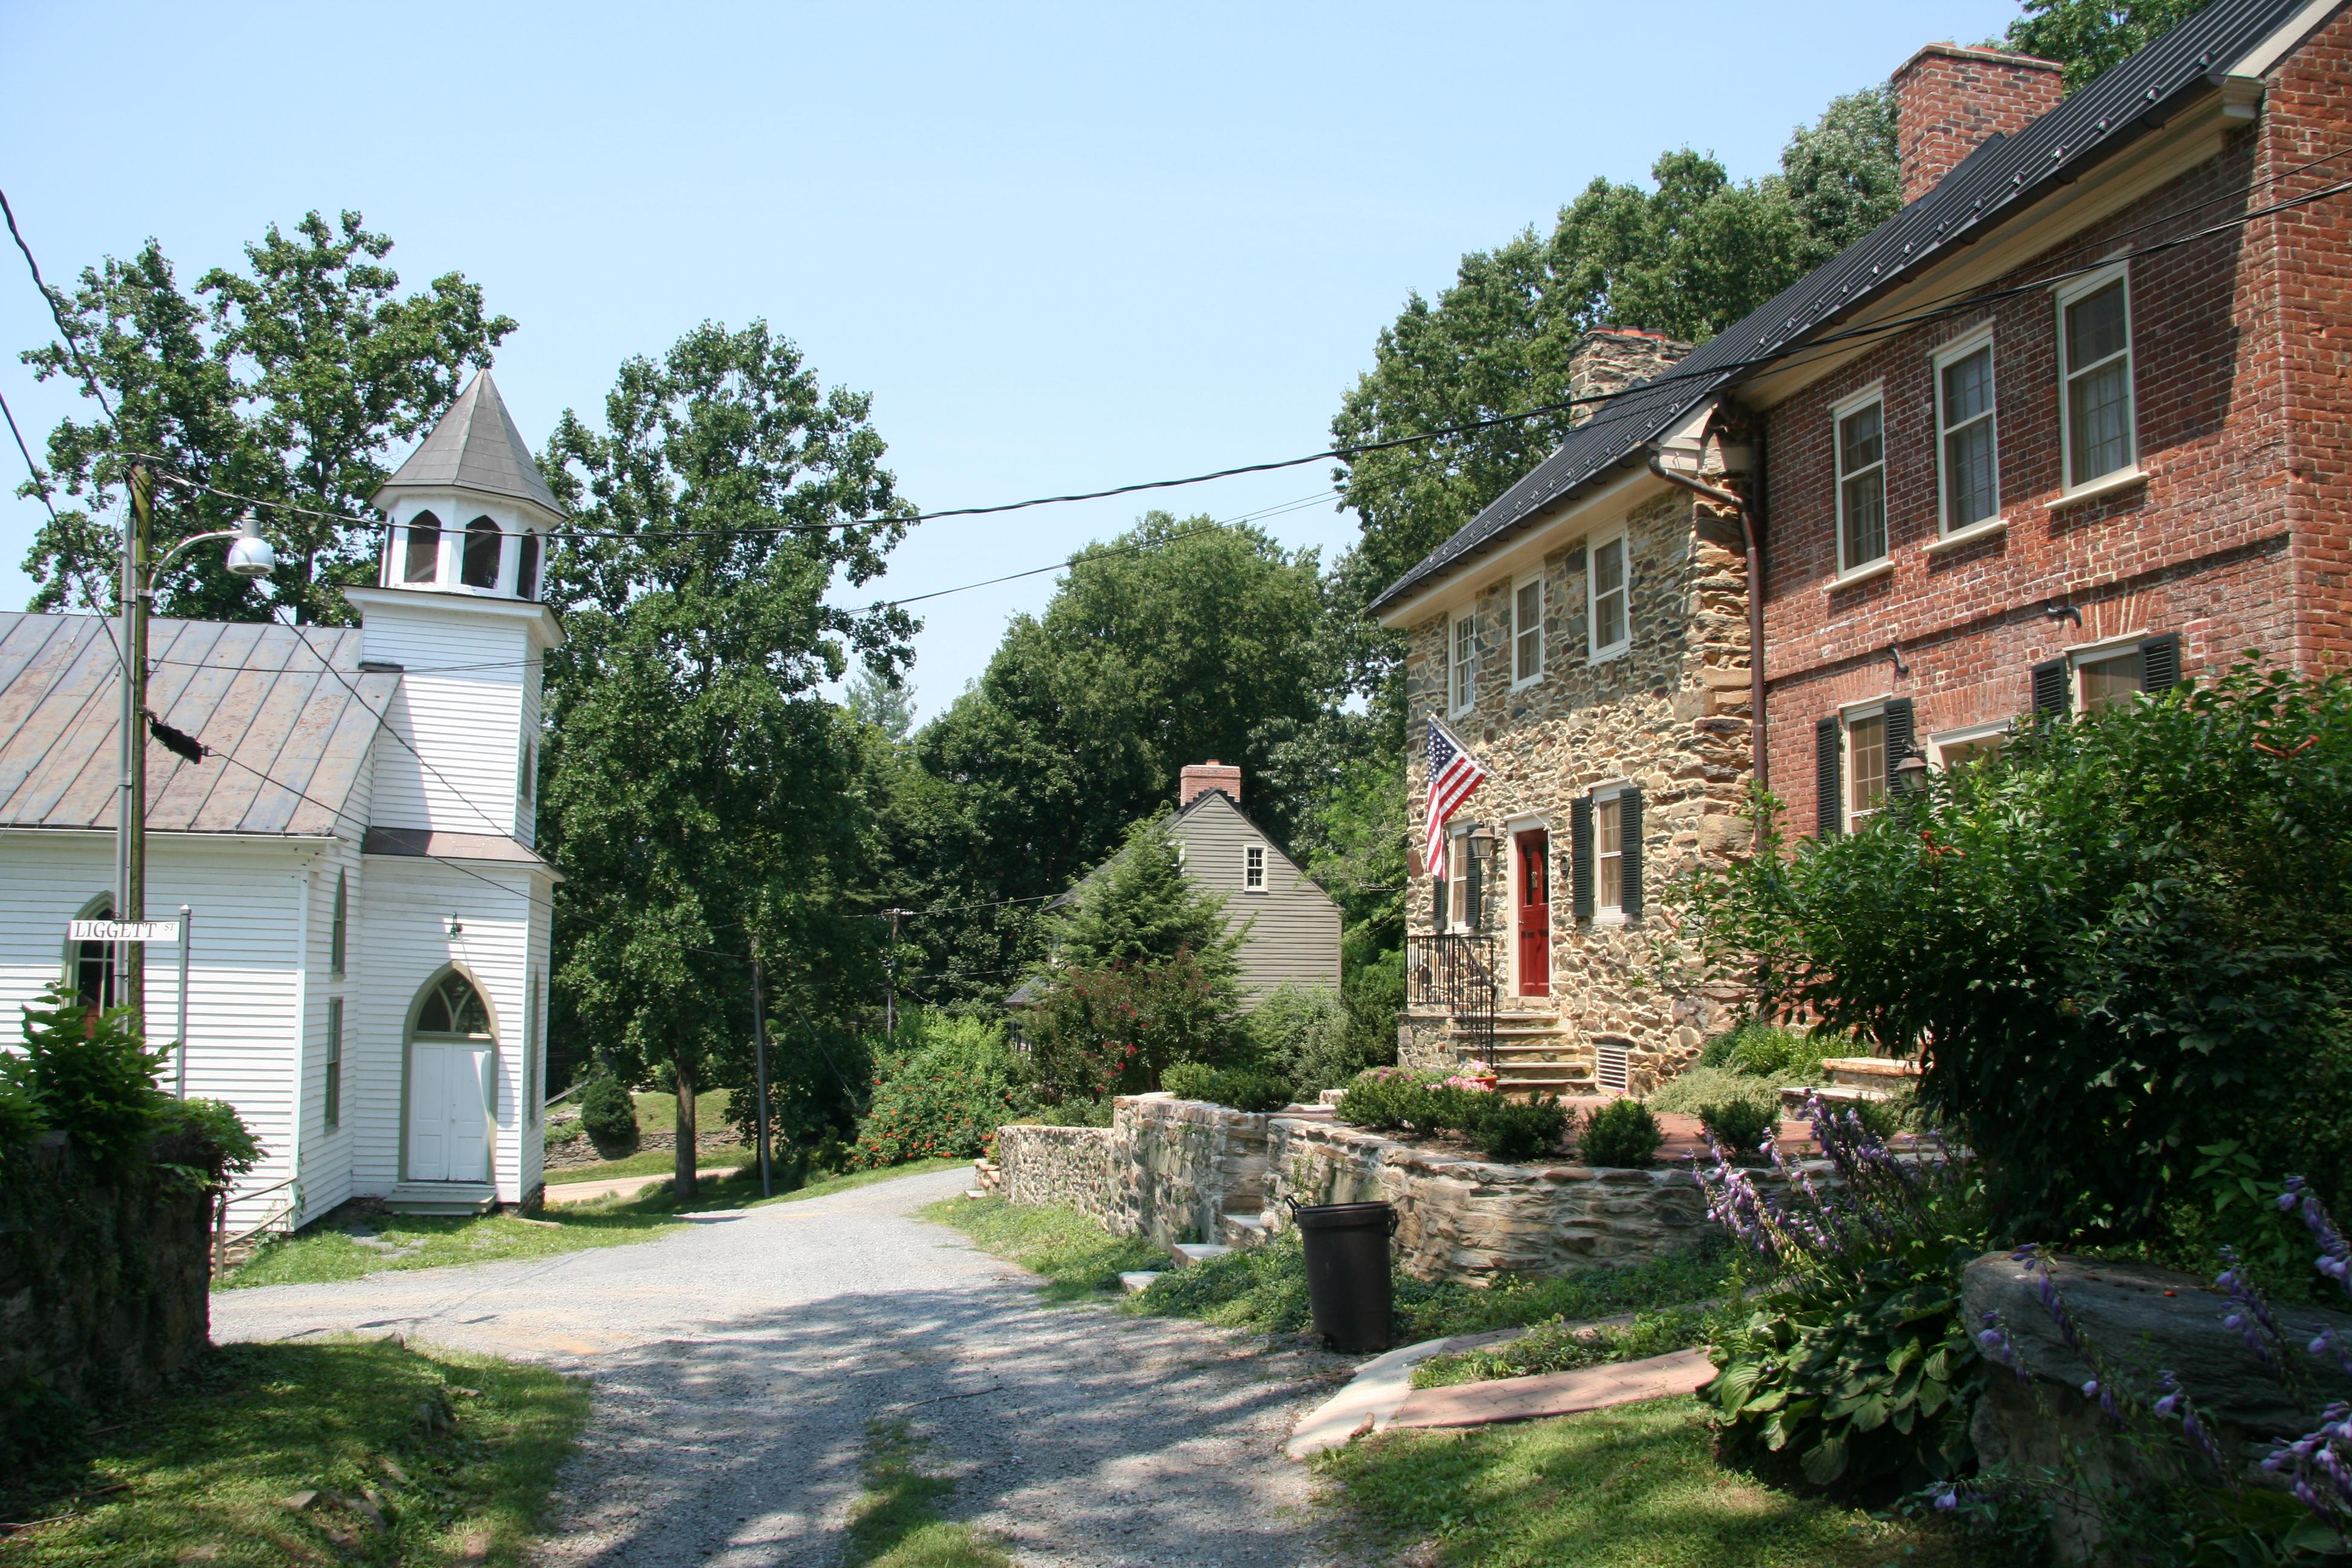 File Waterford Virginia Liggett Street Jpg Wikimedia